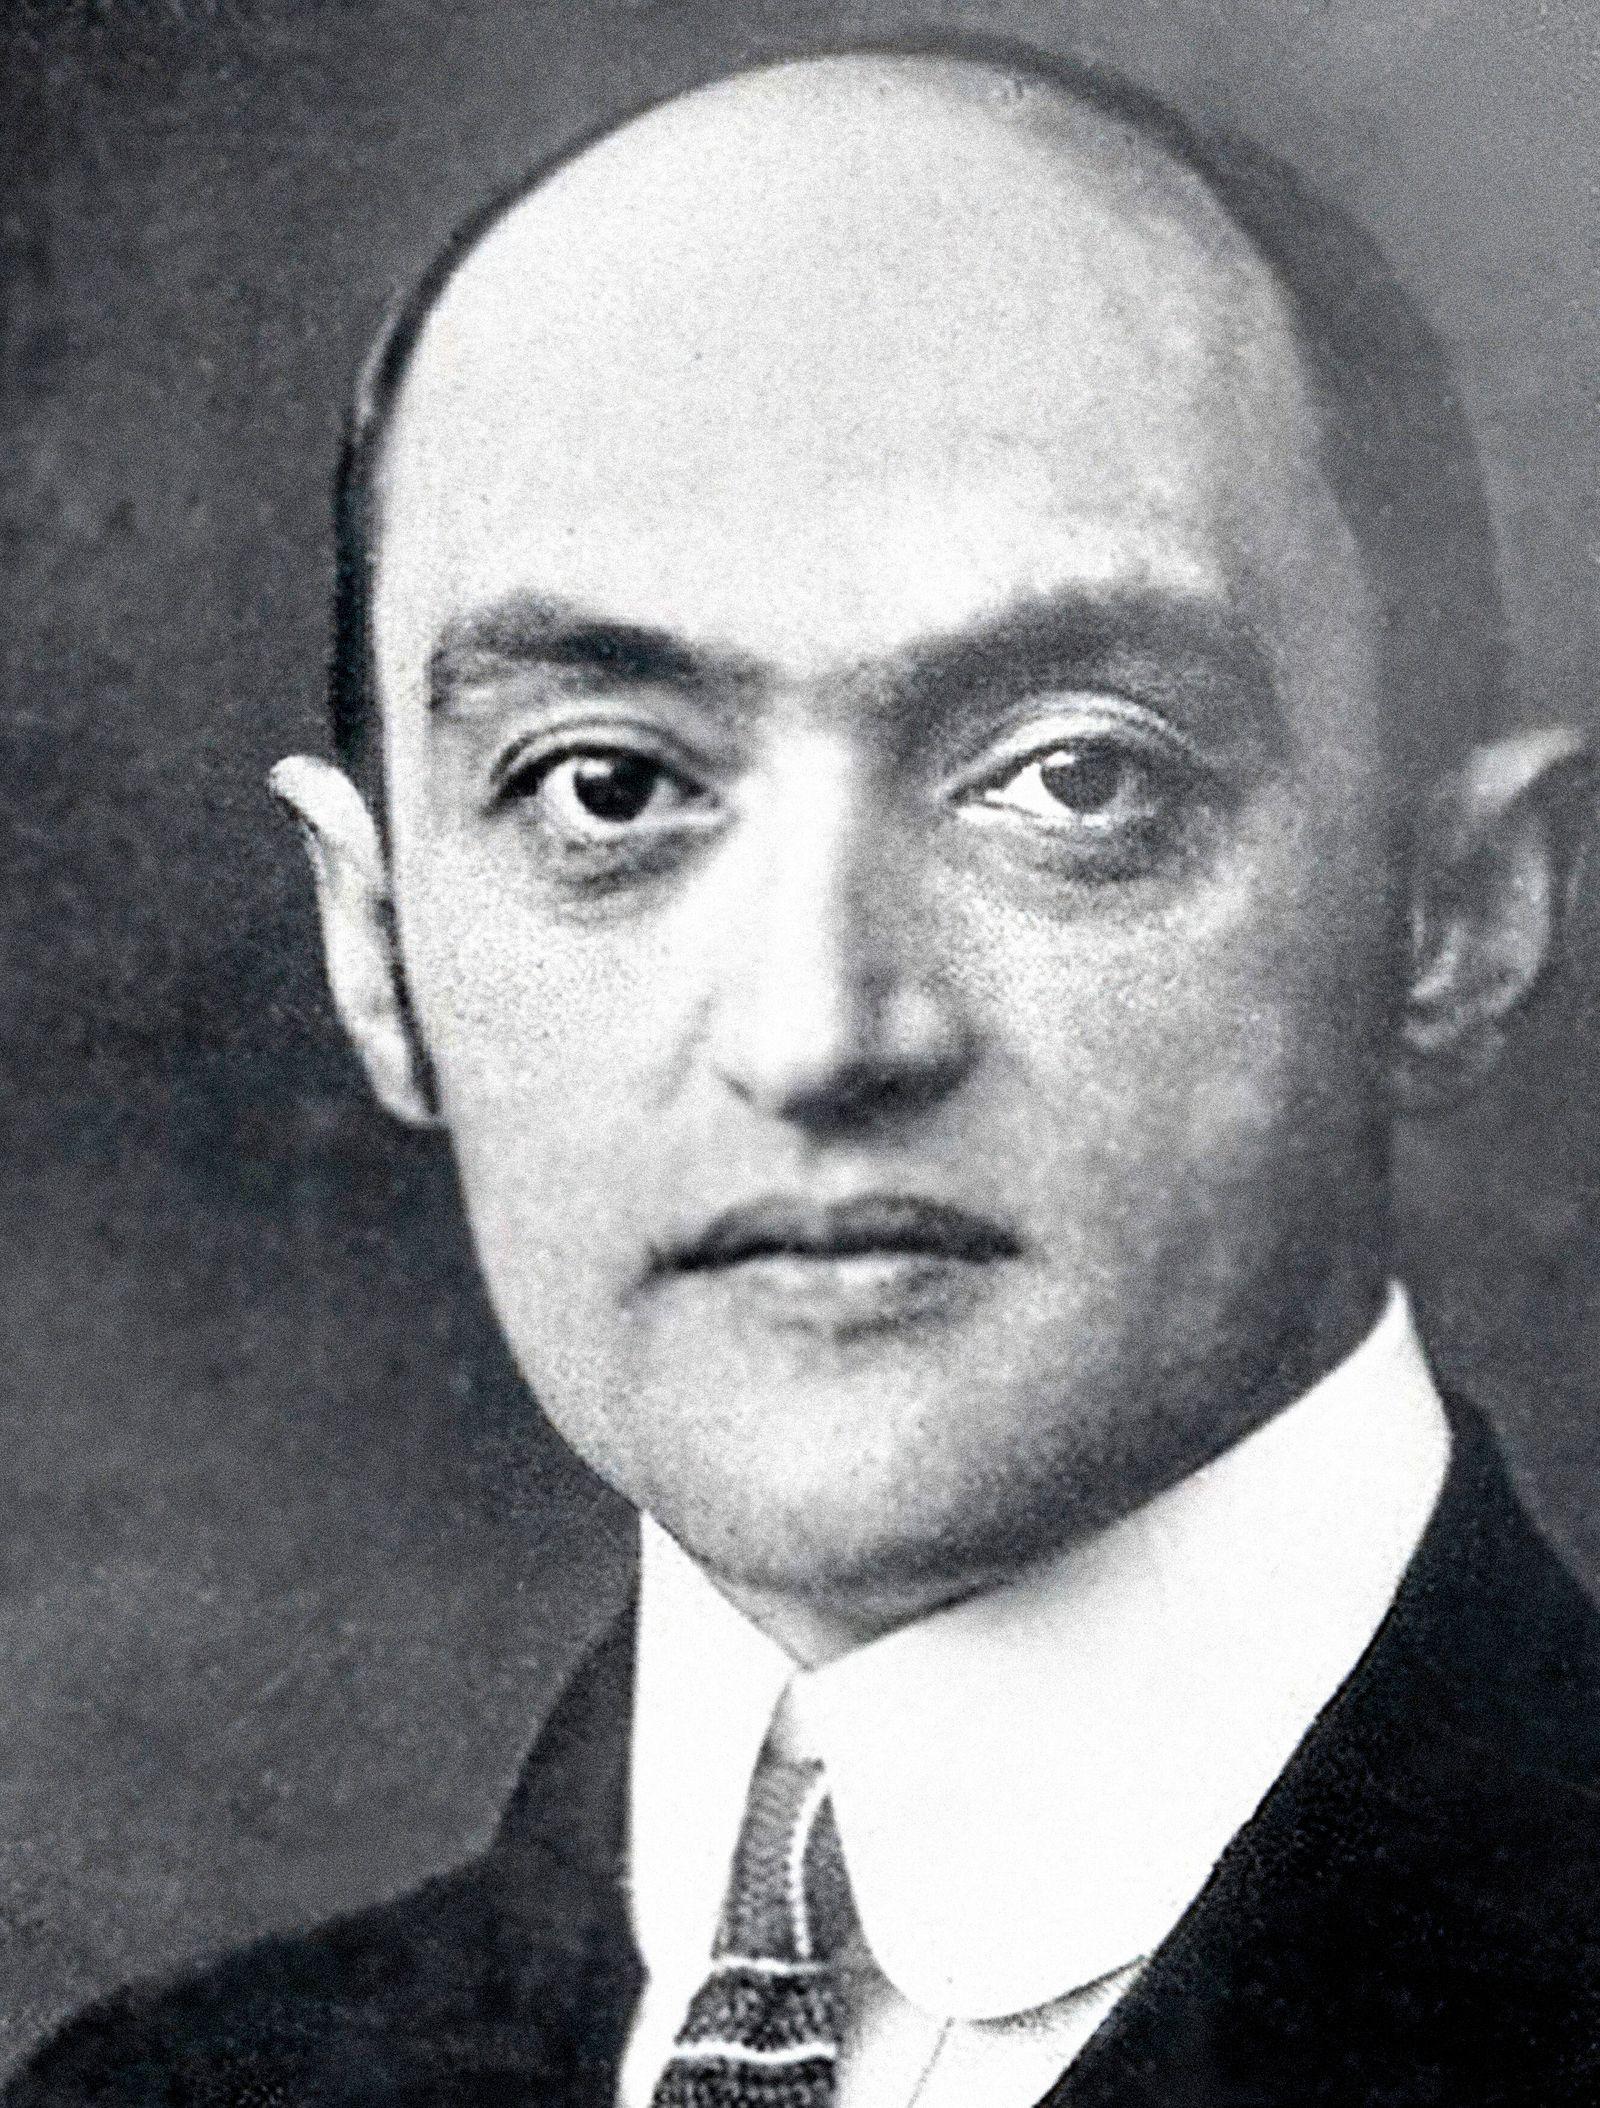 Joseph Schumpeter (1883-1950), Austrian economist (See caption)